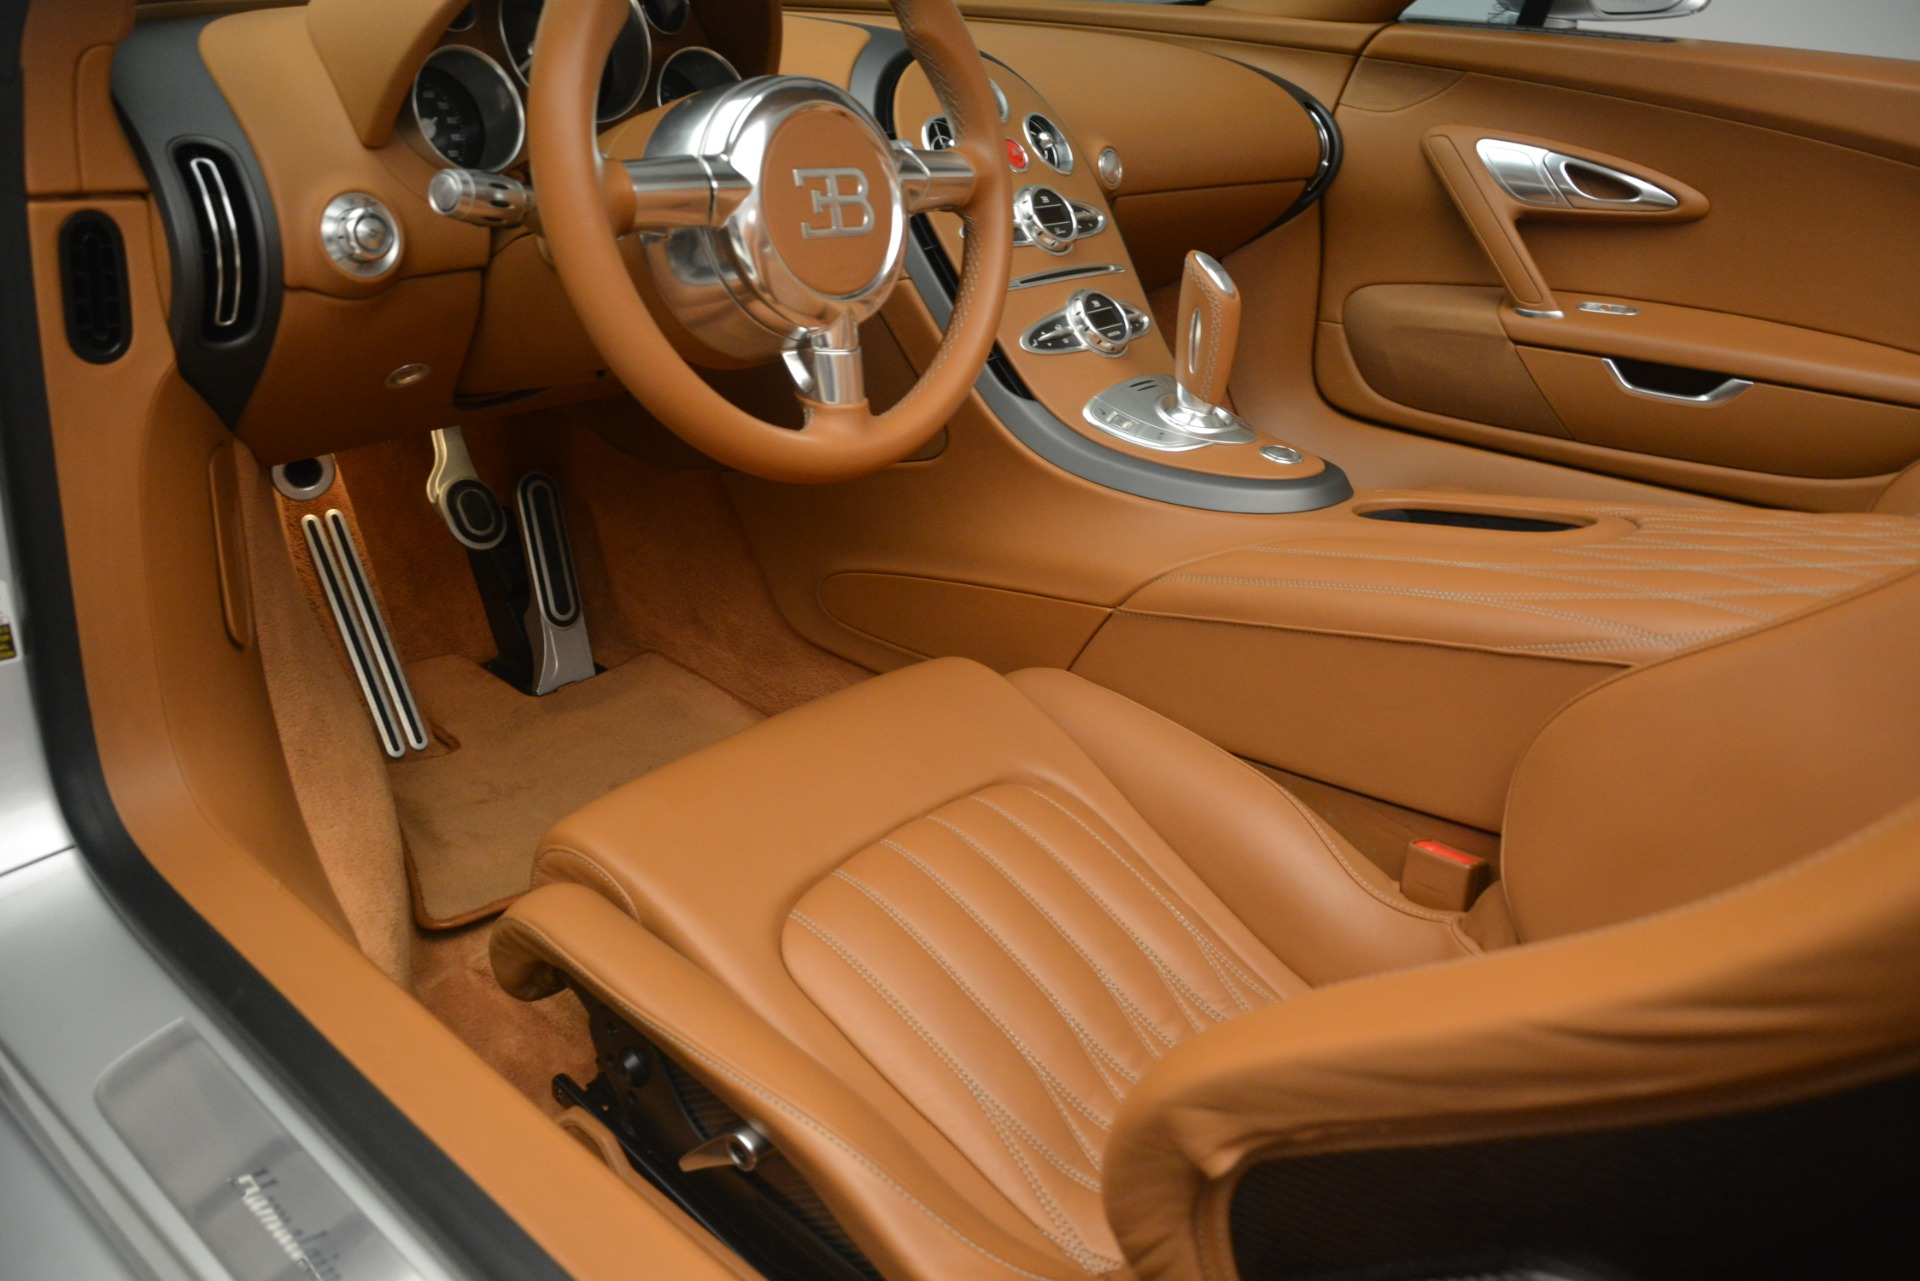 Used 2010 Bugatti Veyron 16.4 Grand Sport For Sale In Greenwich, CT 3159_p30